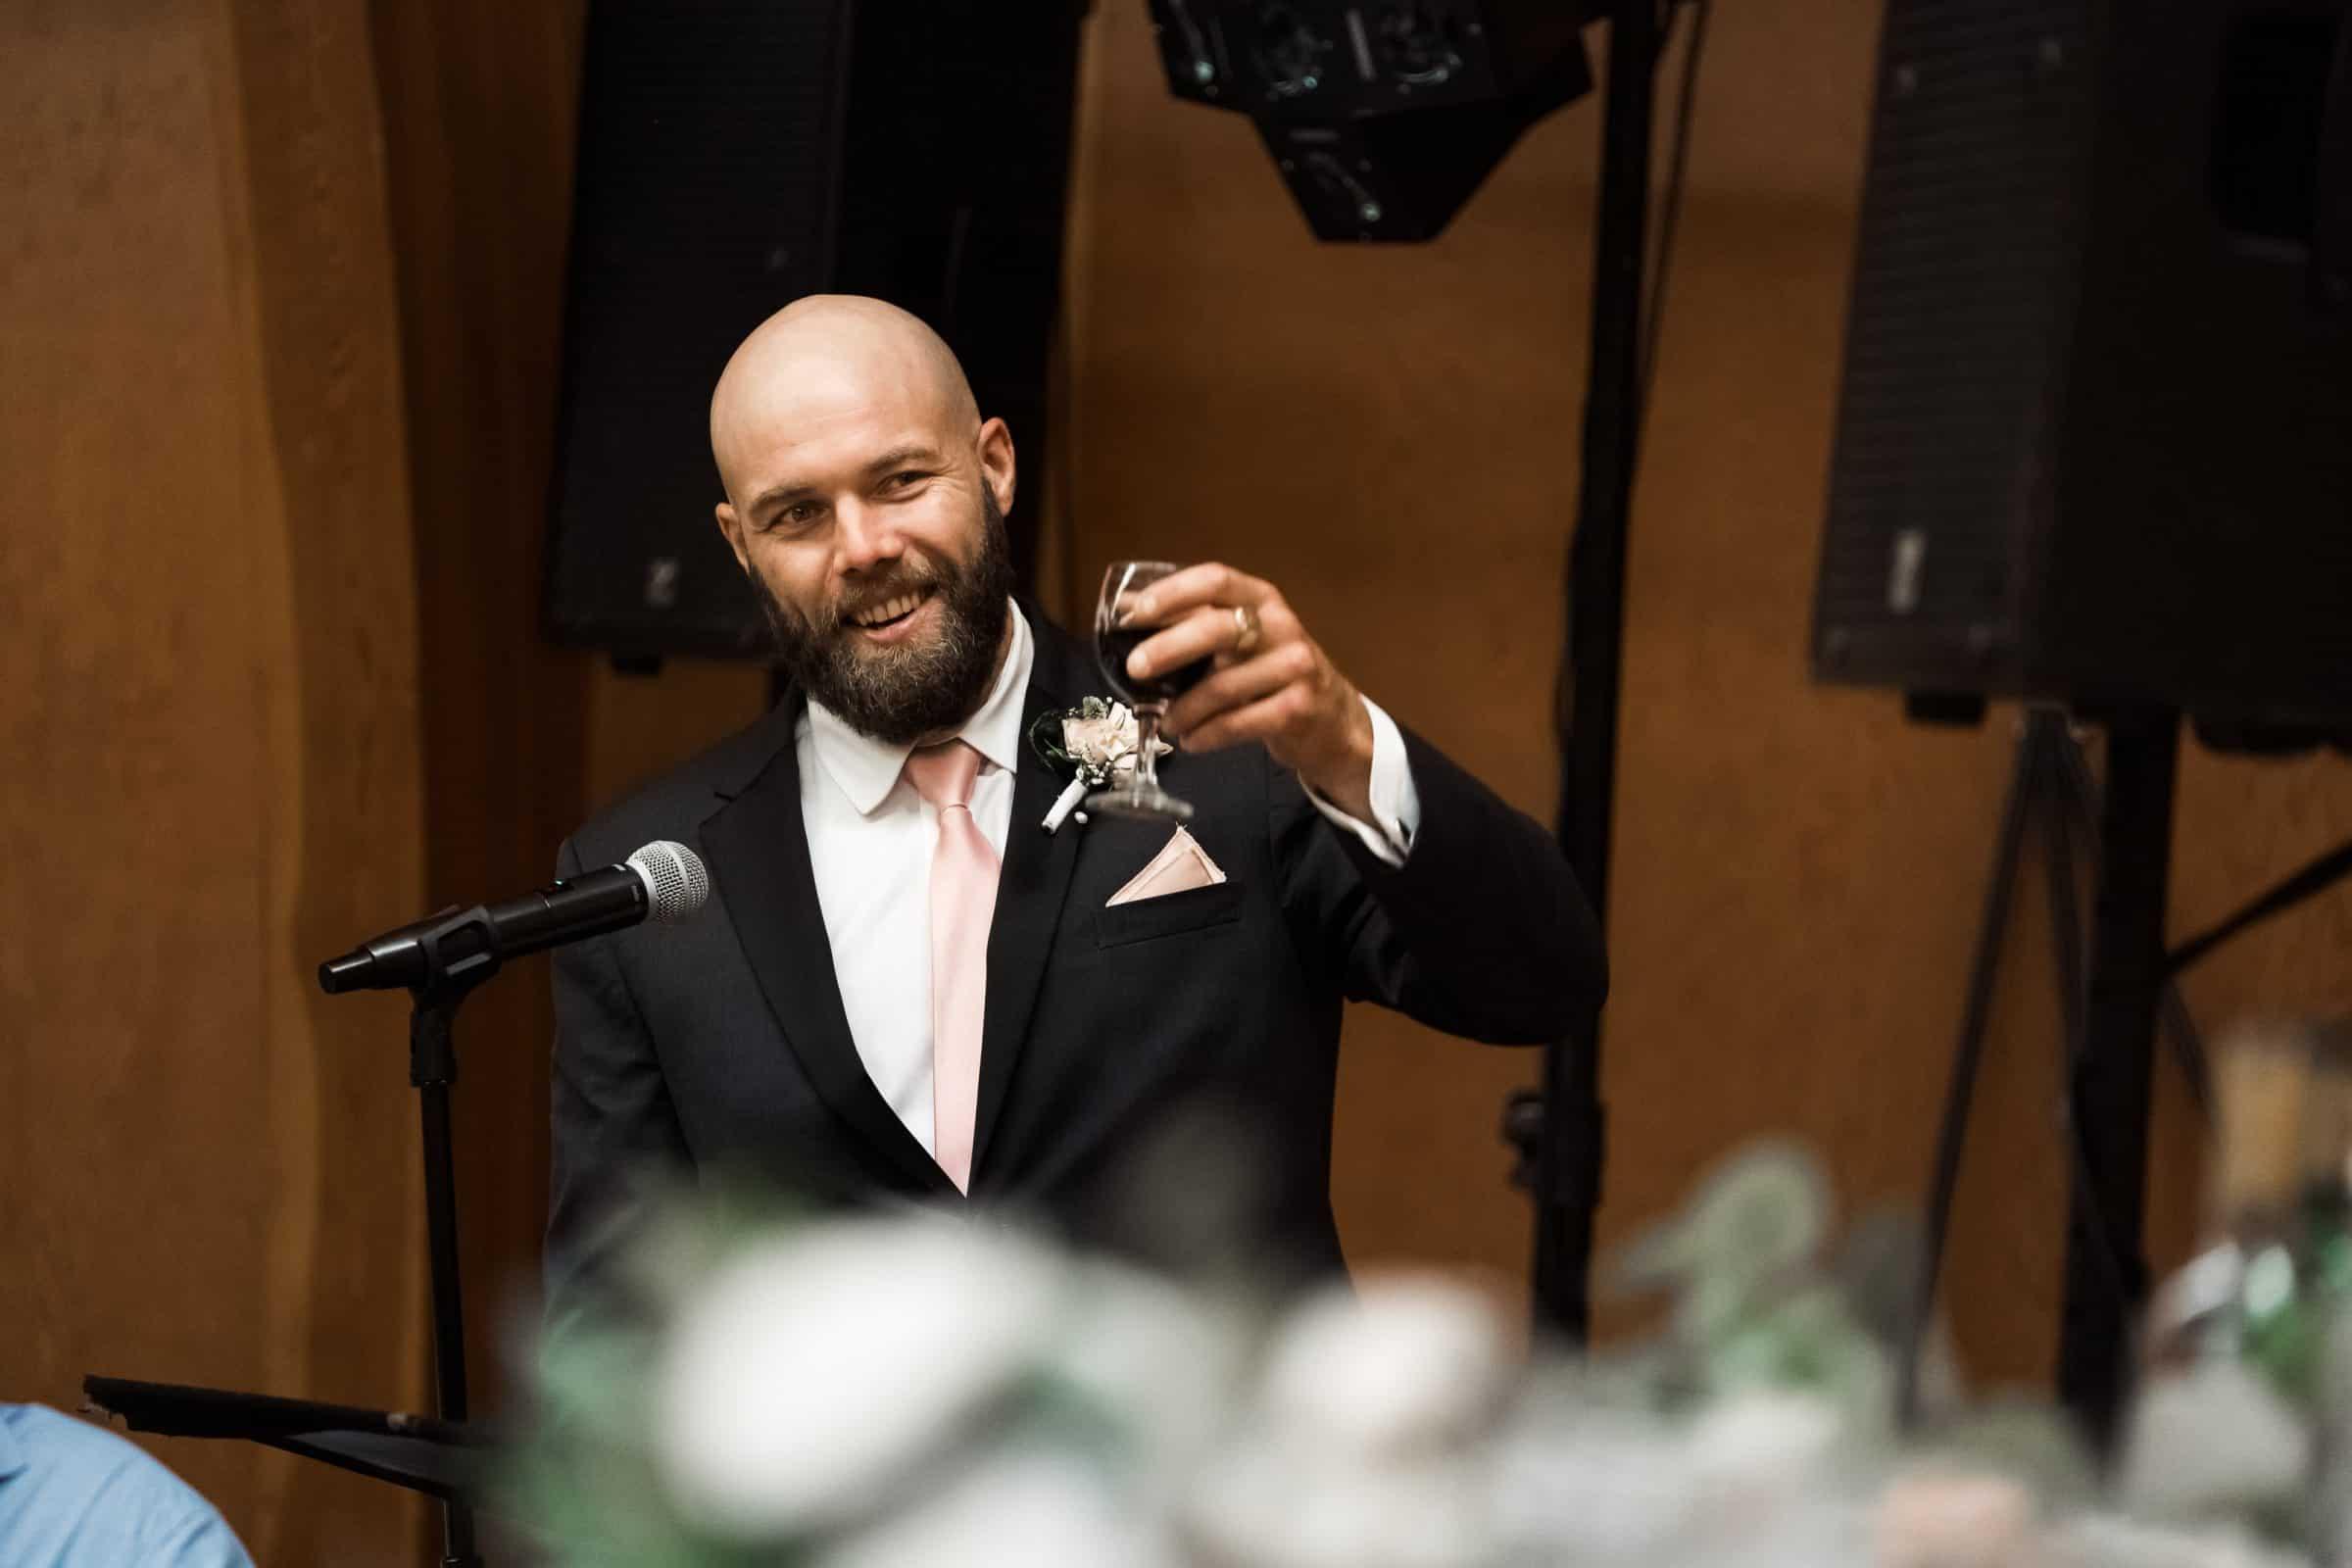 groomsman lifting glass in cheers